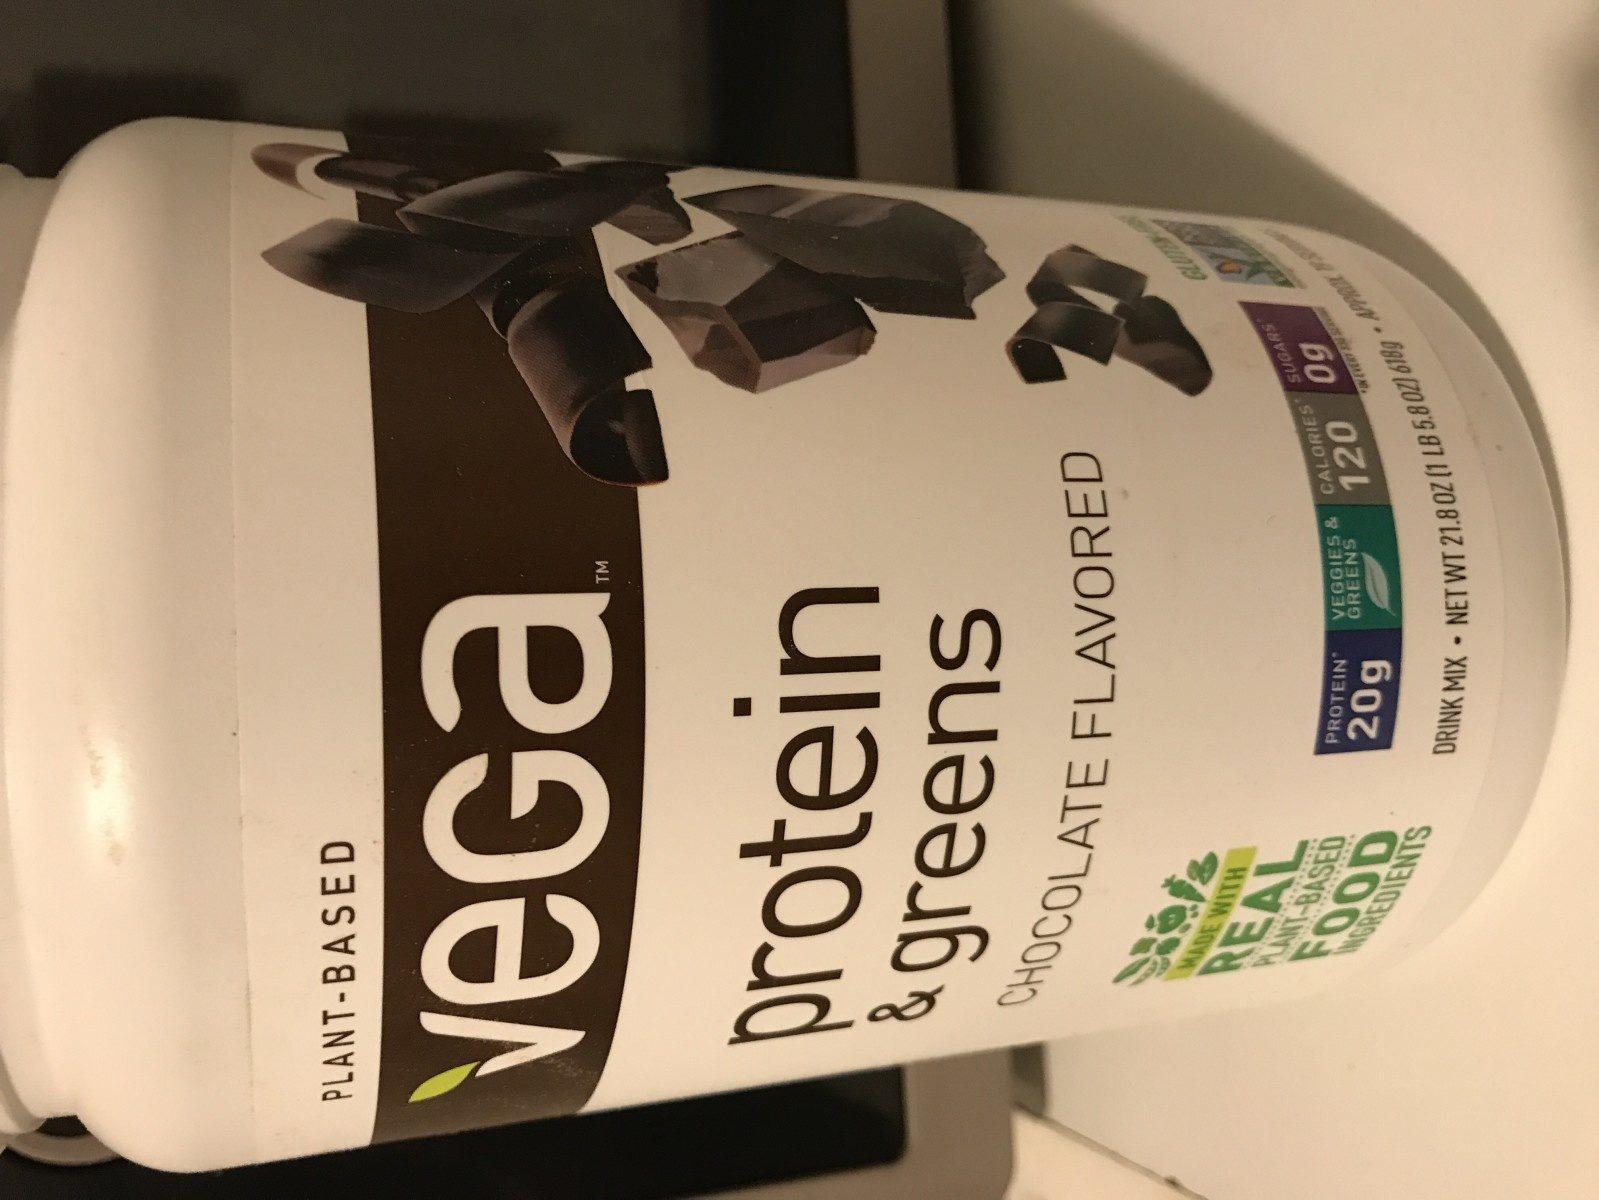 Vega protein & greens - Ingredients